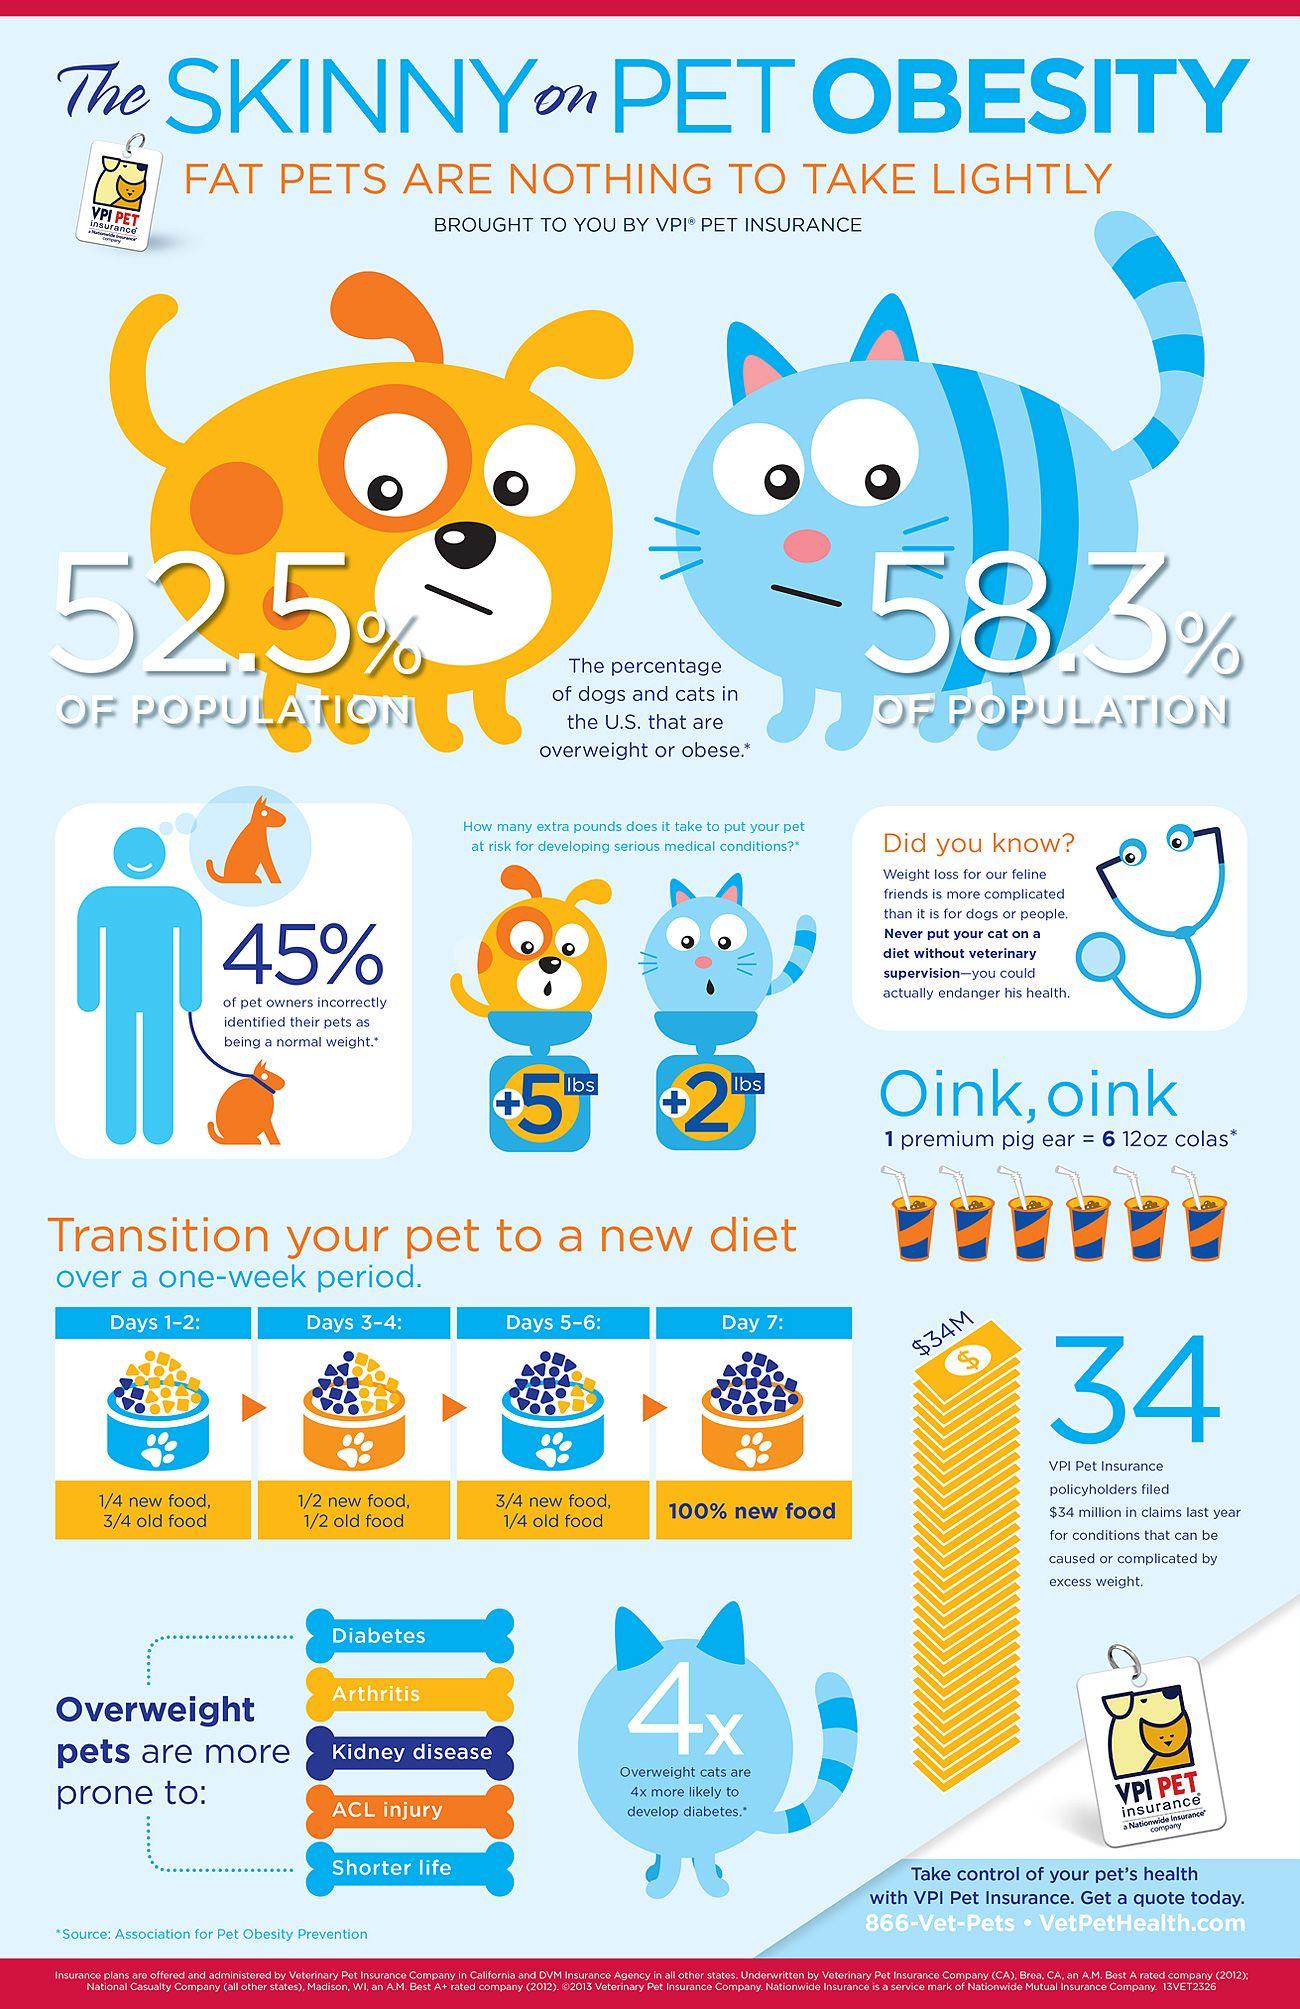 Veterinary Pet Insurance, Pet Health Insurance Plans for